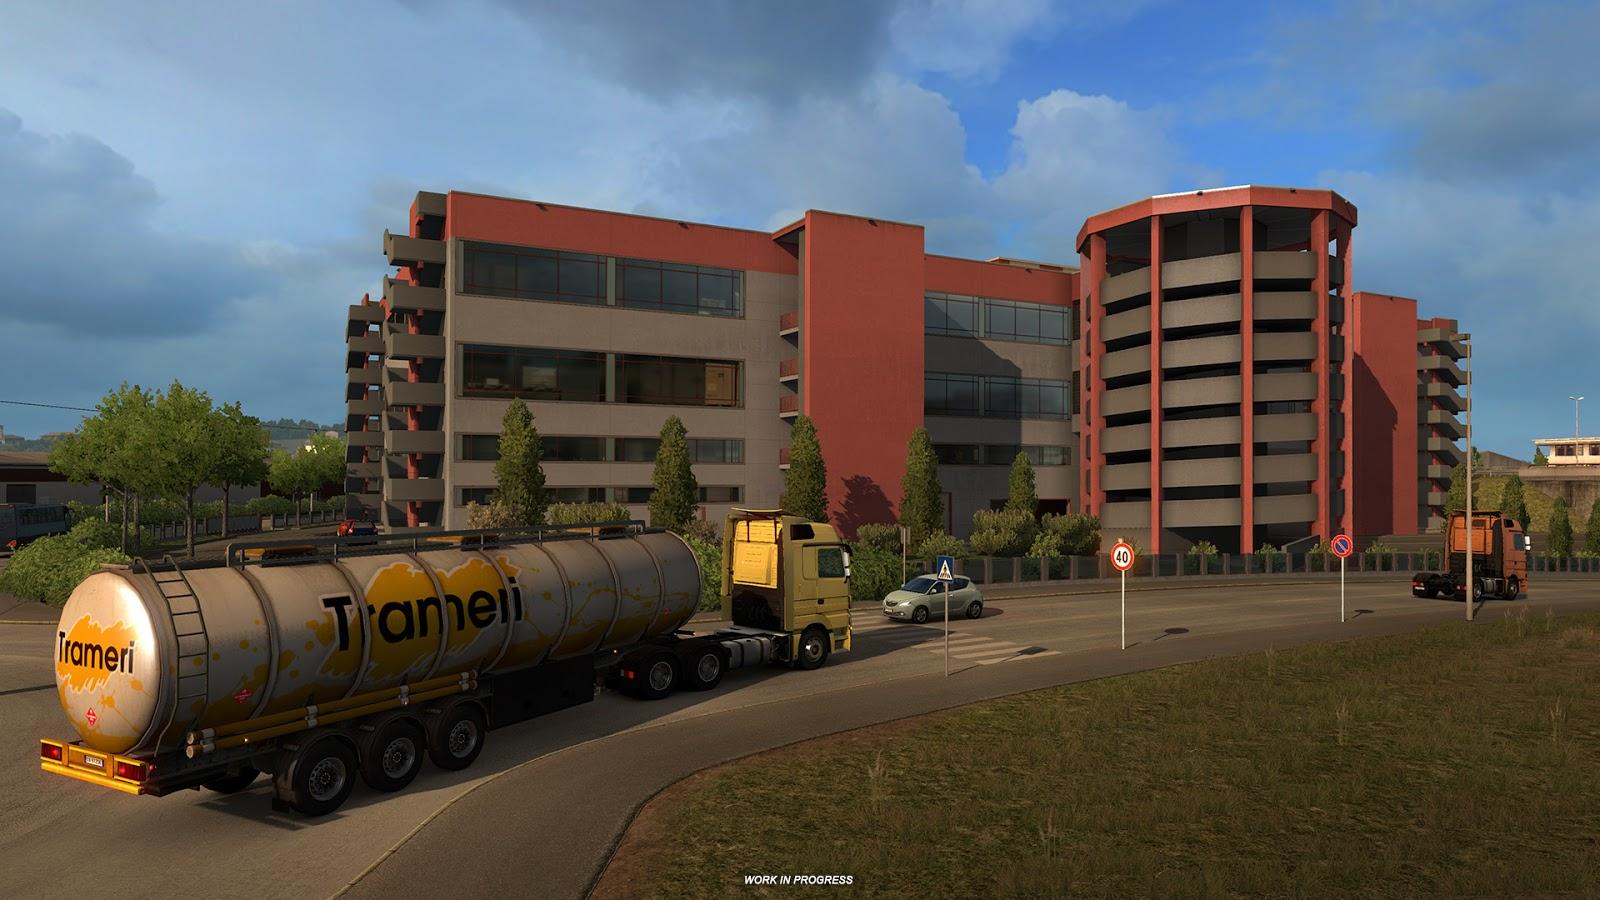 A Look at Architecture in Euro Truck Simulator's Bella